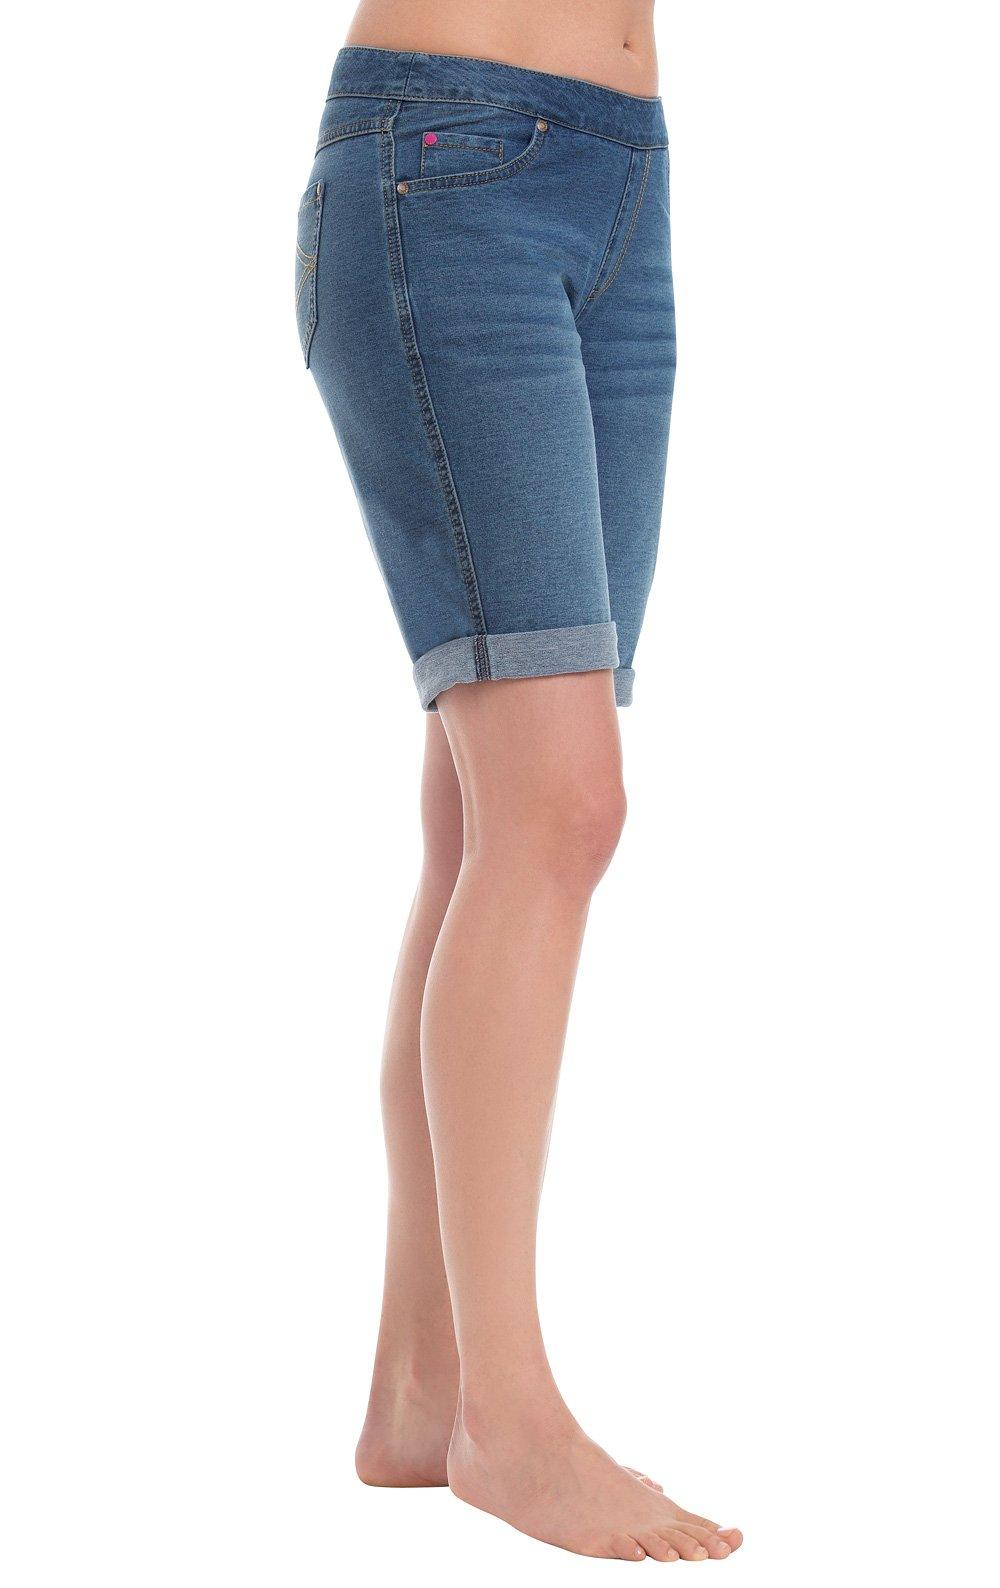 PajamaJeans Women's Lightweight Stretch Denim Bermuda Shorts, Bluestone, Medium